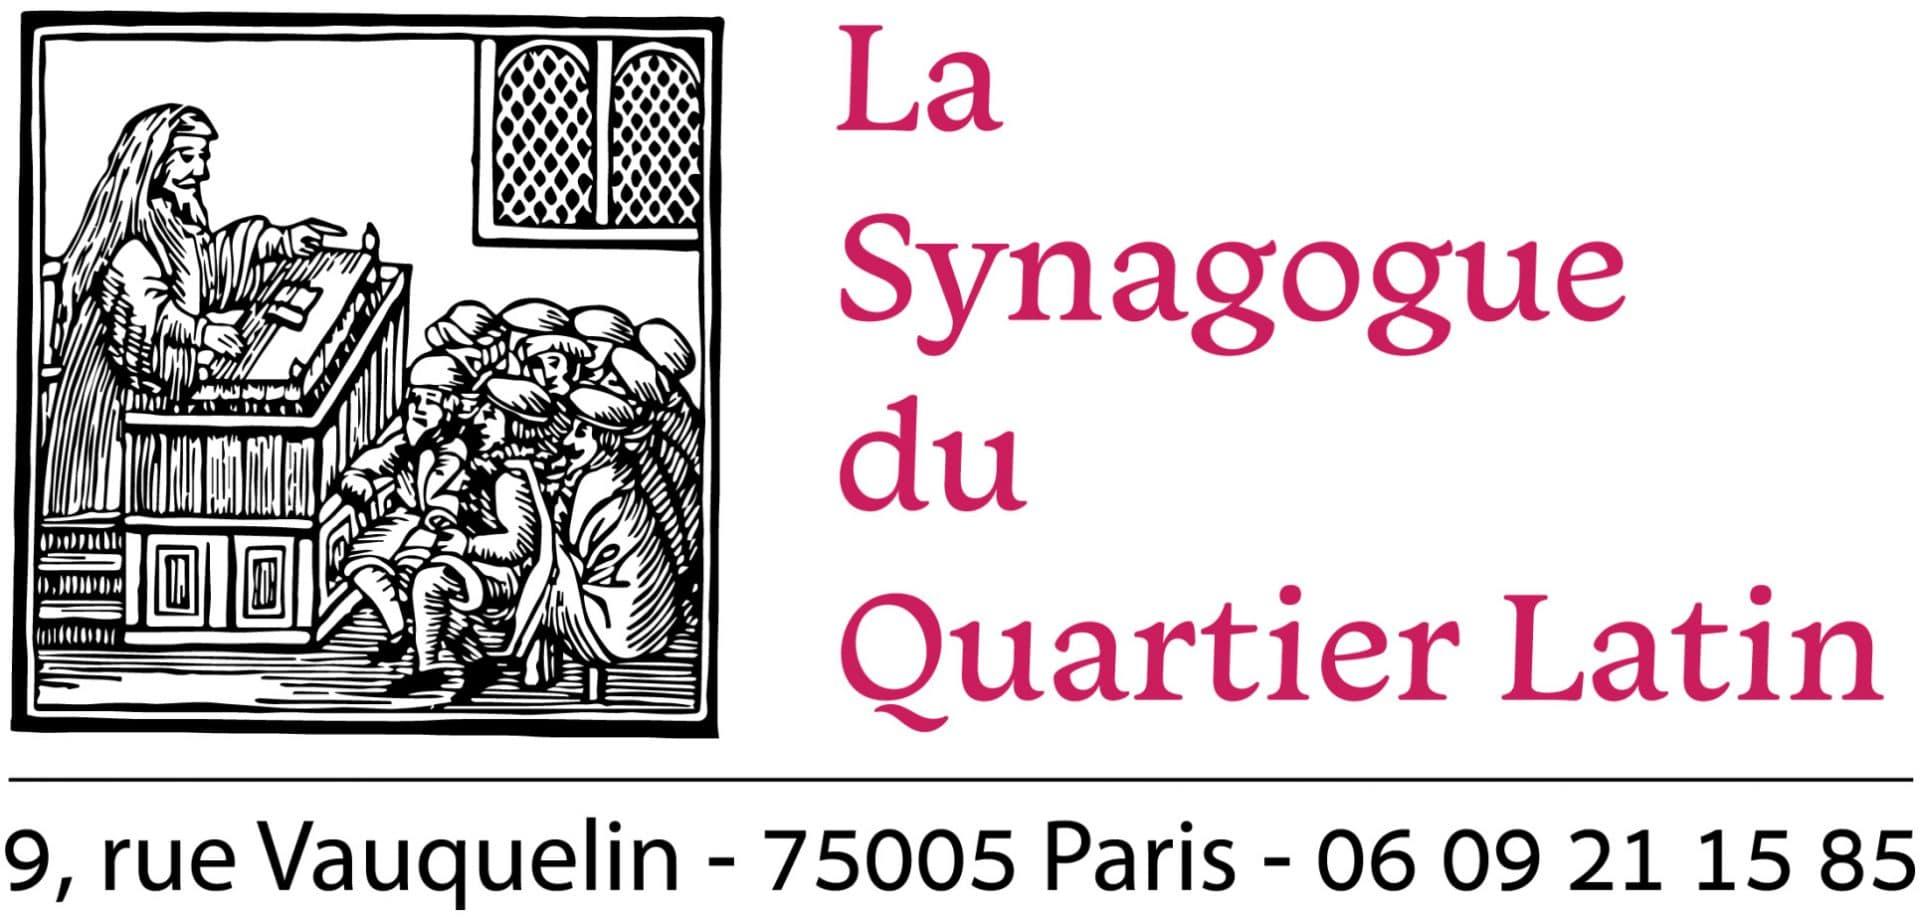 synagogue rue vauquelin paris synagogue du quartier latin paris. Black Bedroom Furniture Sets. Home Design Ideas